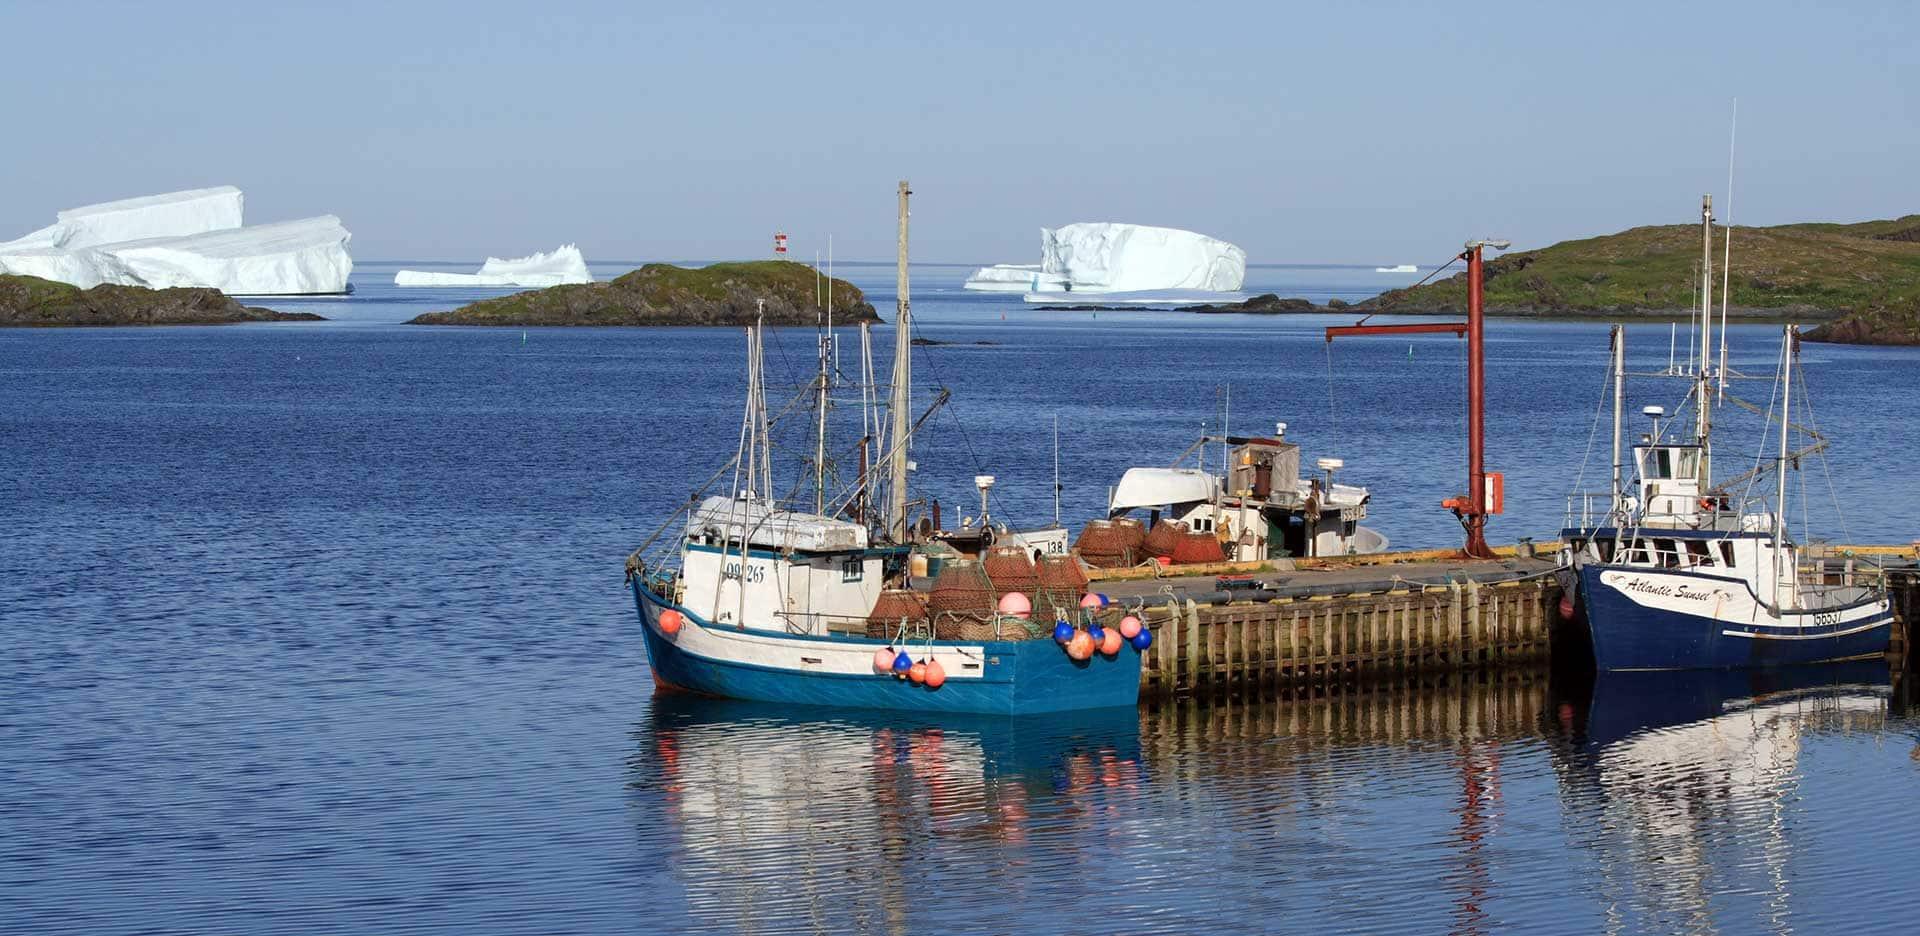 Icebergs off coast of Goose Cove, Newfoundland. Photo: istock, Photawa